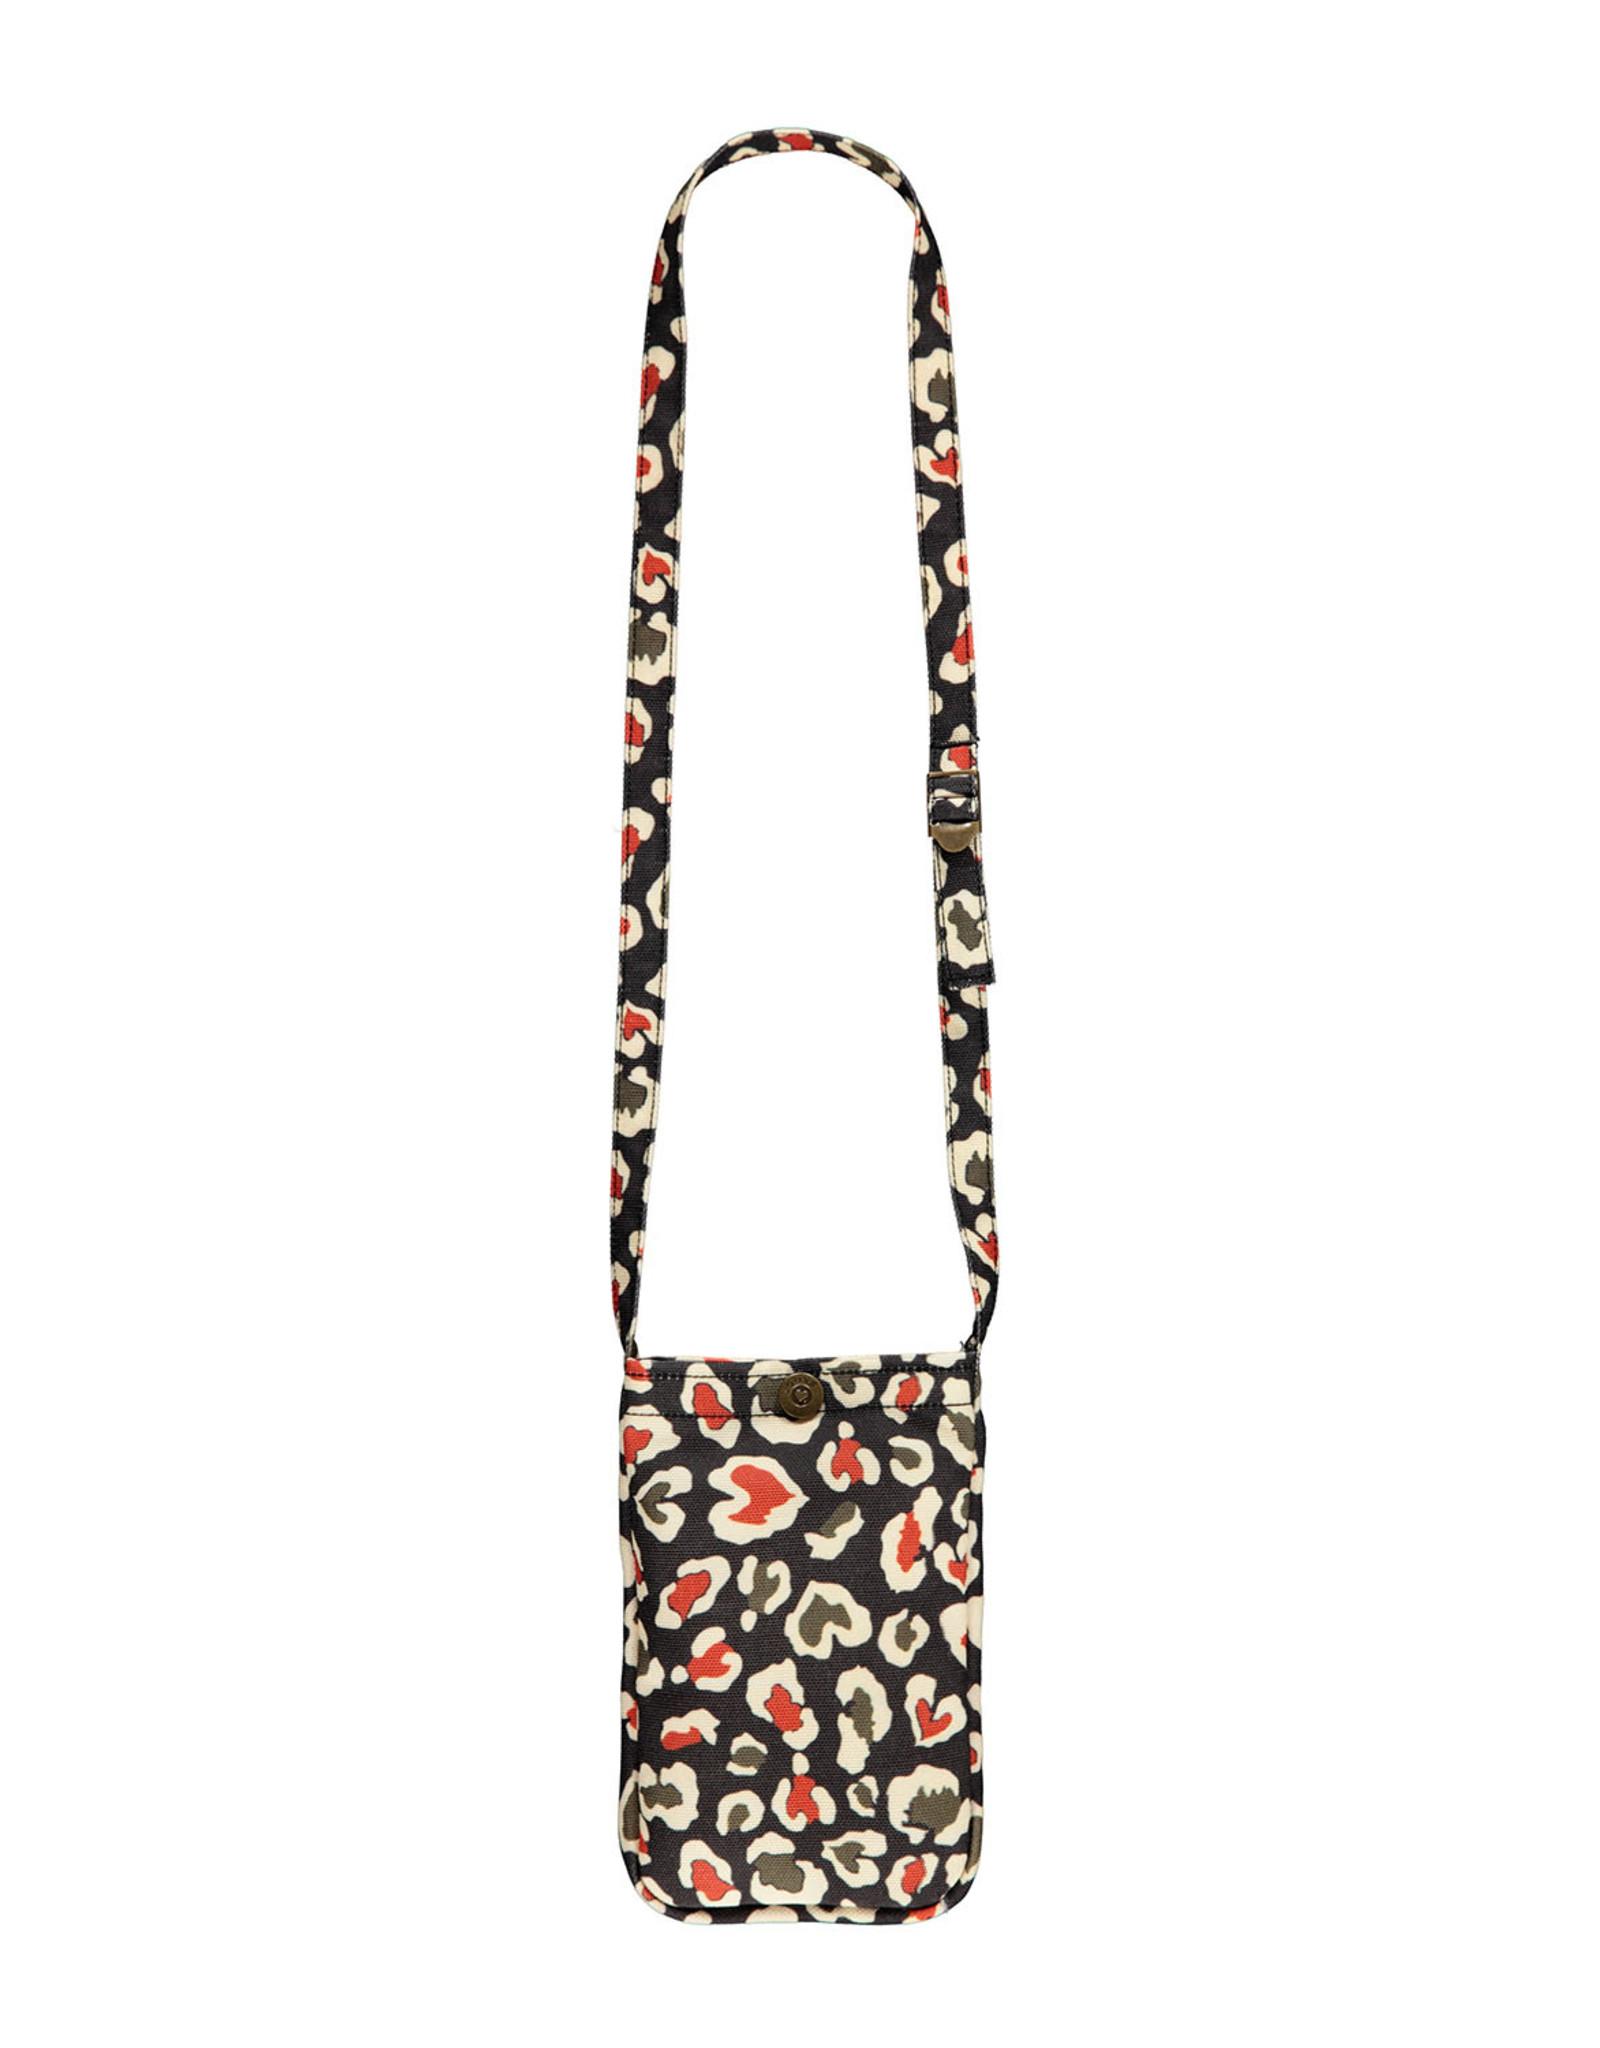 Looxs 10SIXTEEN 10Sixteen Telephone bag